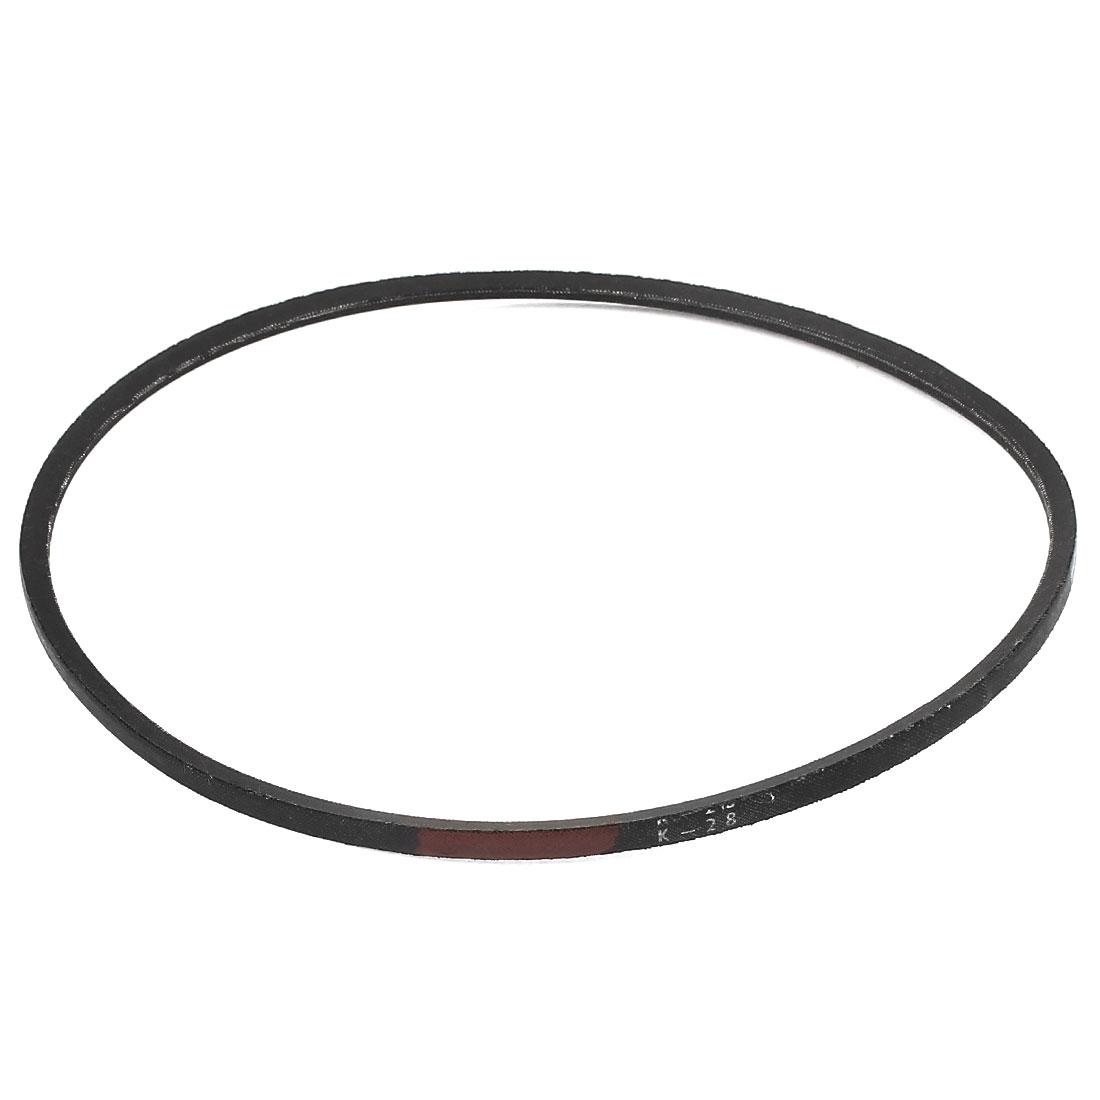 Machinery Drive Band Rubber K Type K28 V Belt Black